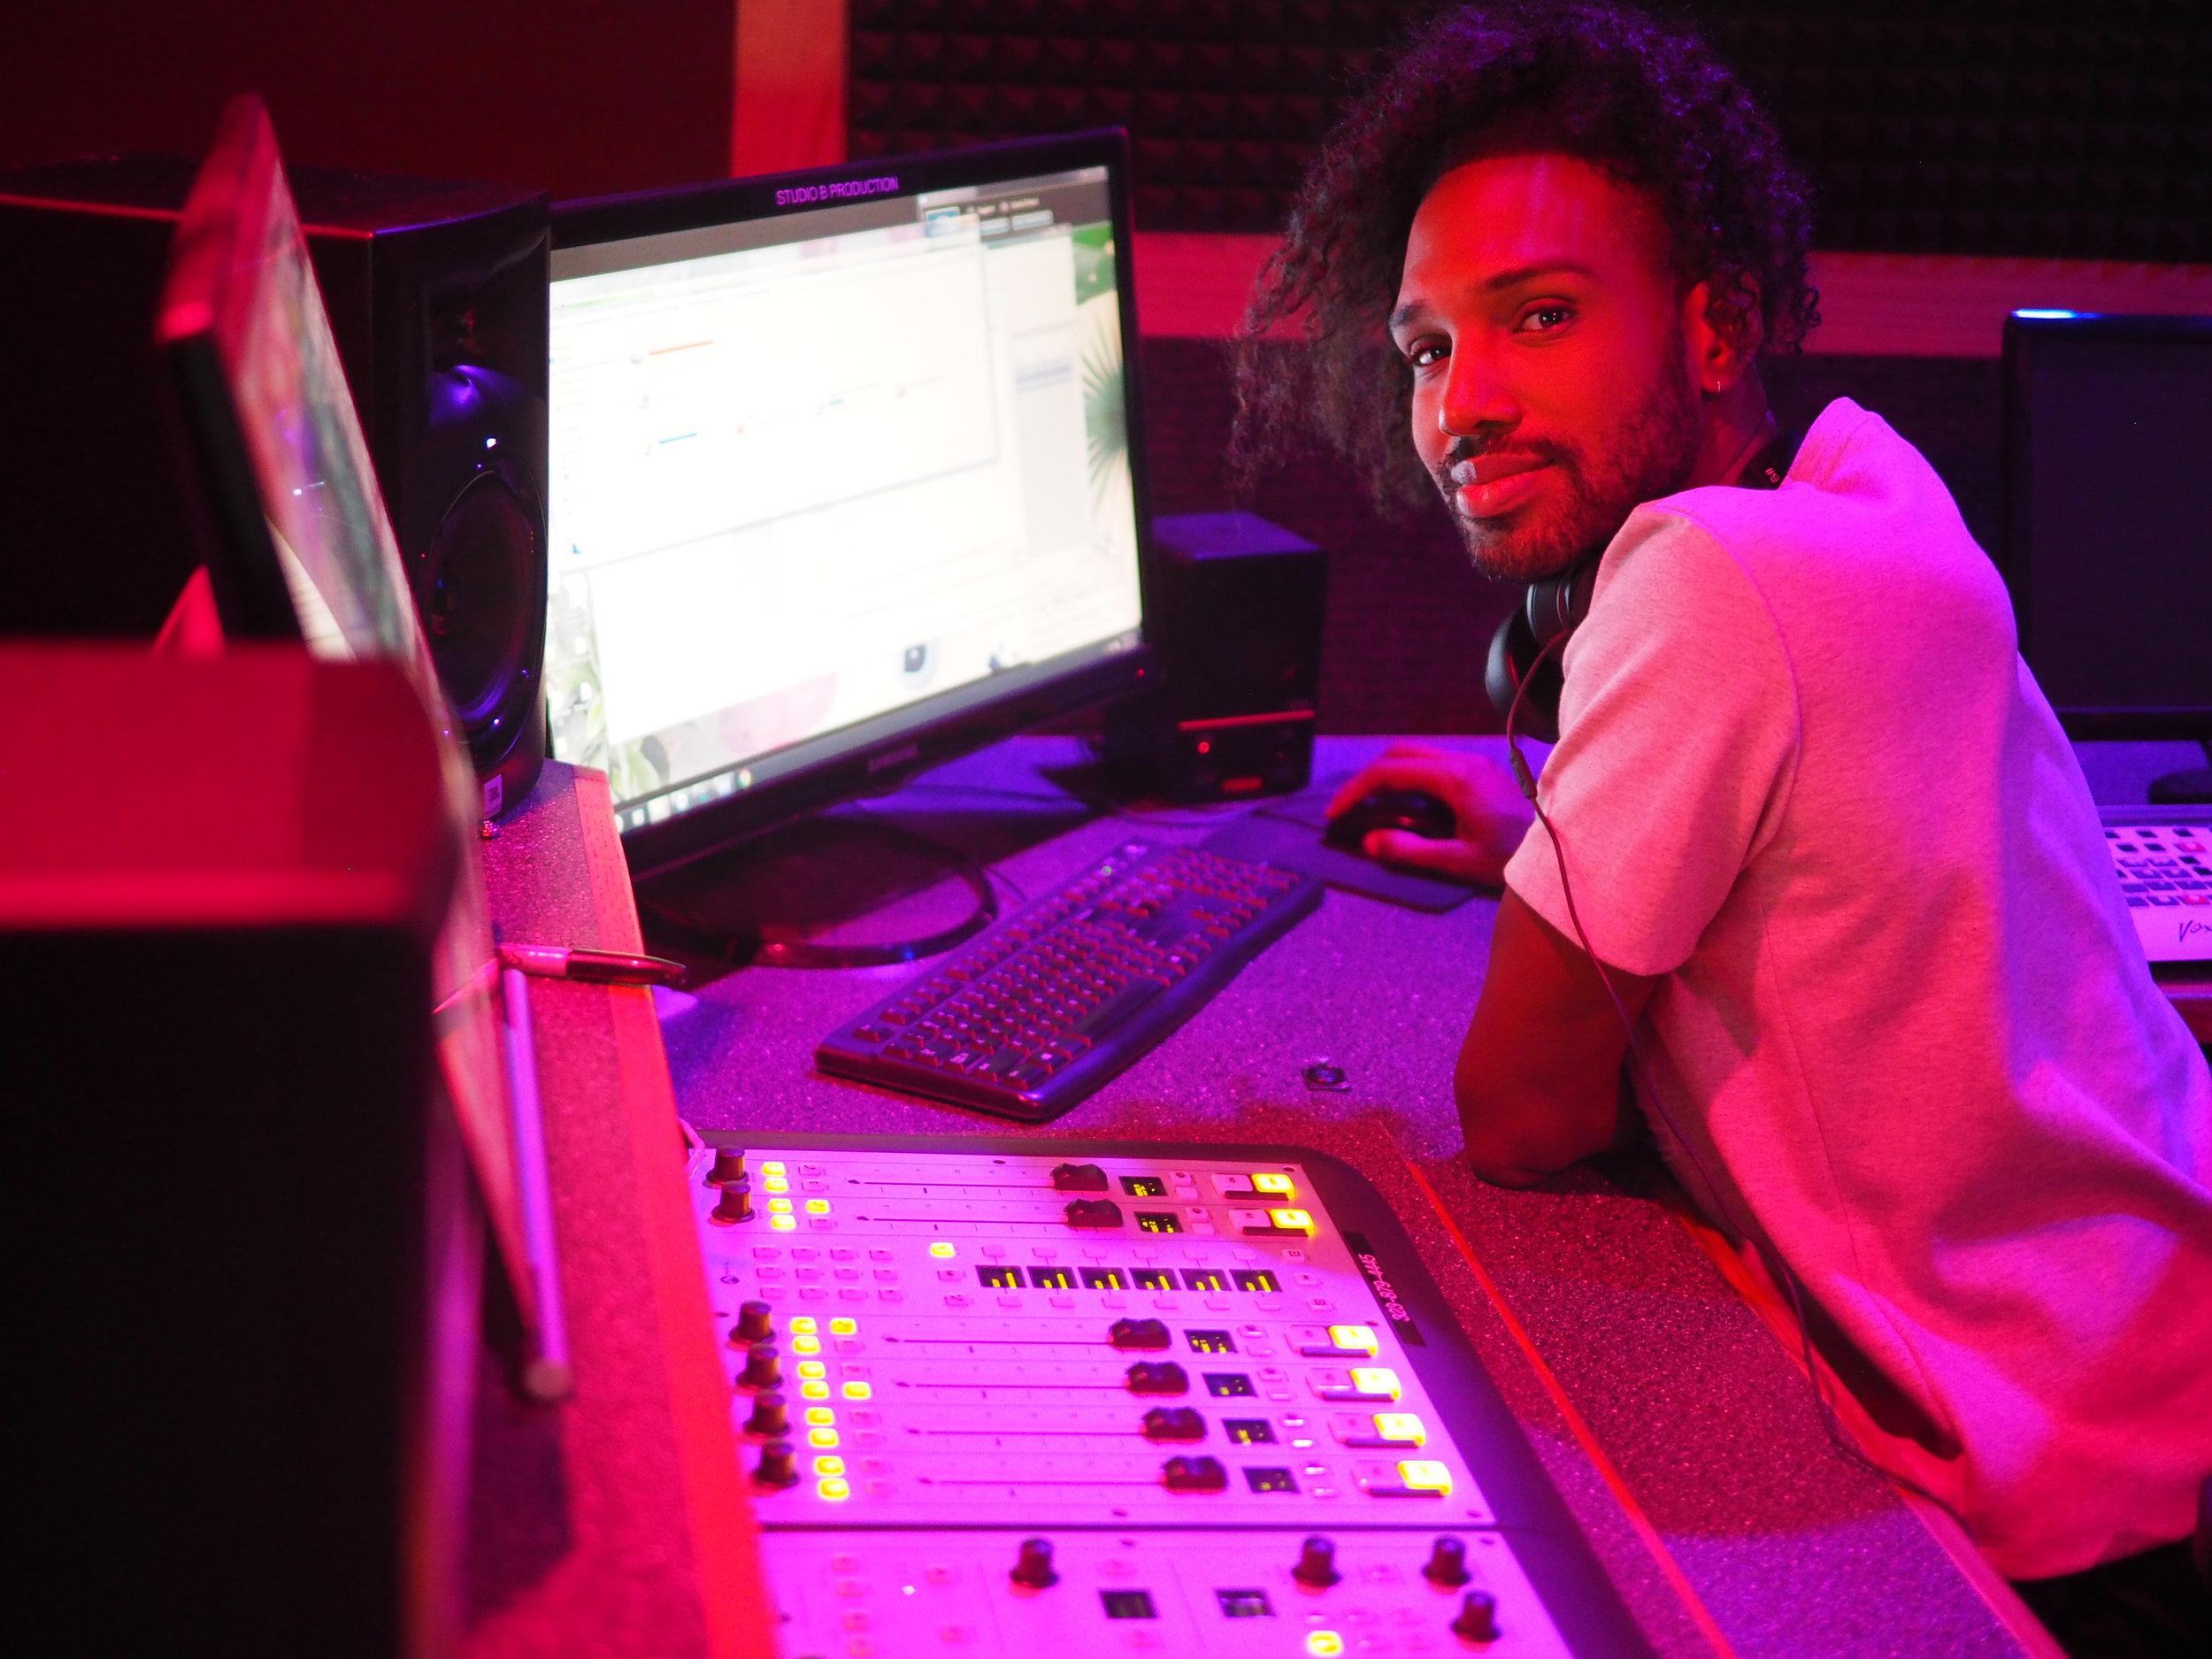 Dash radio x Twerking on the topics - Writing, Production, Host